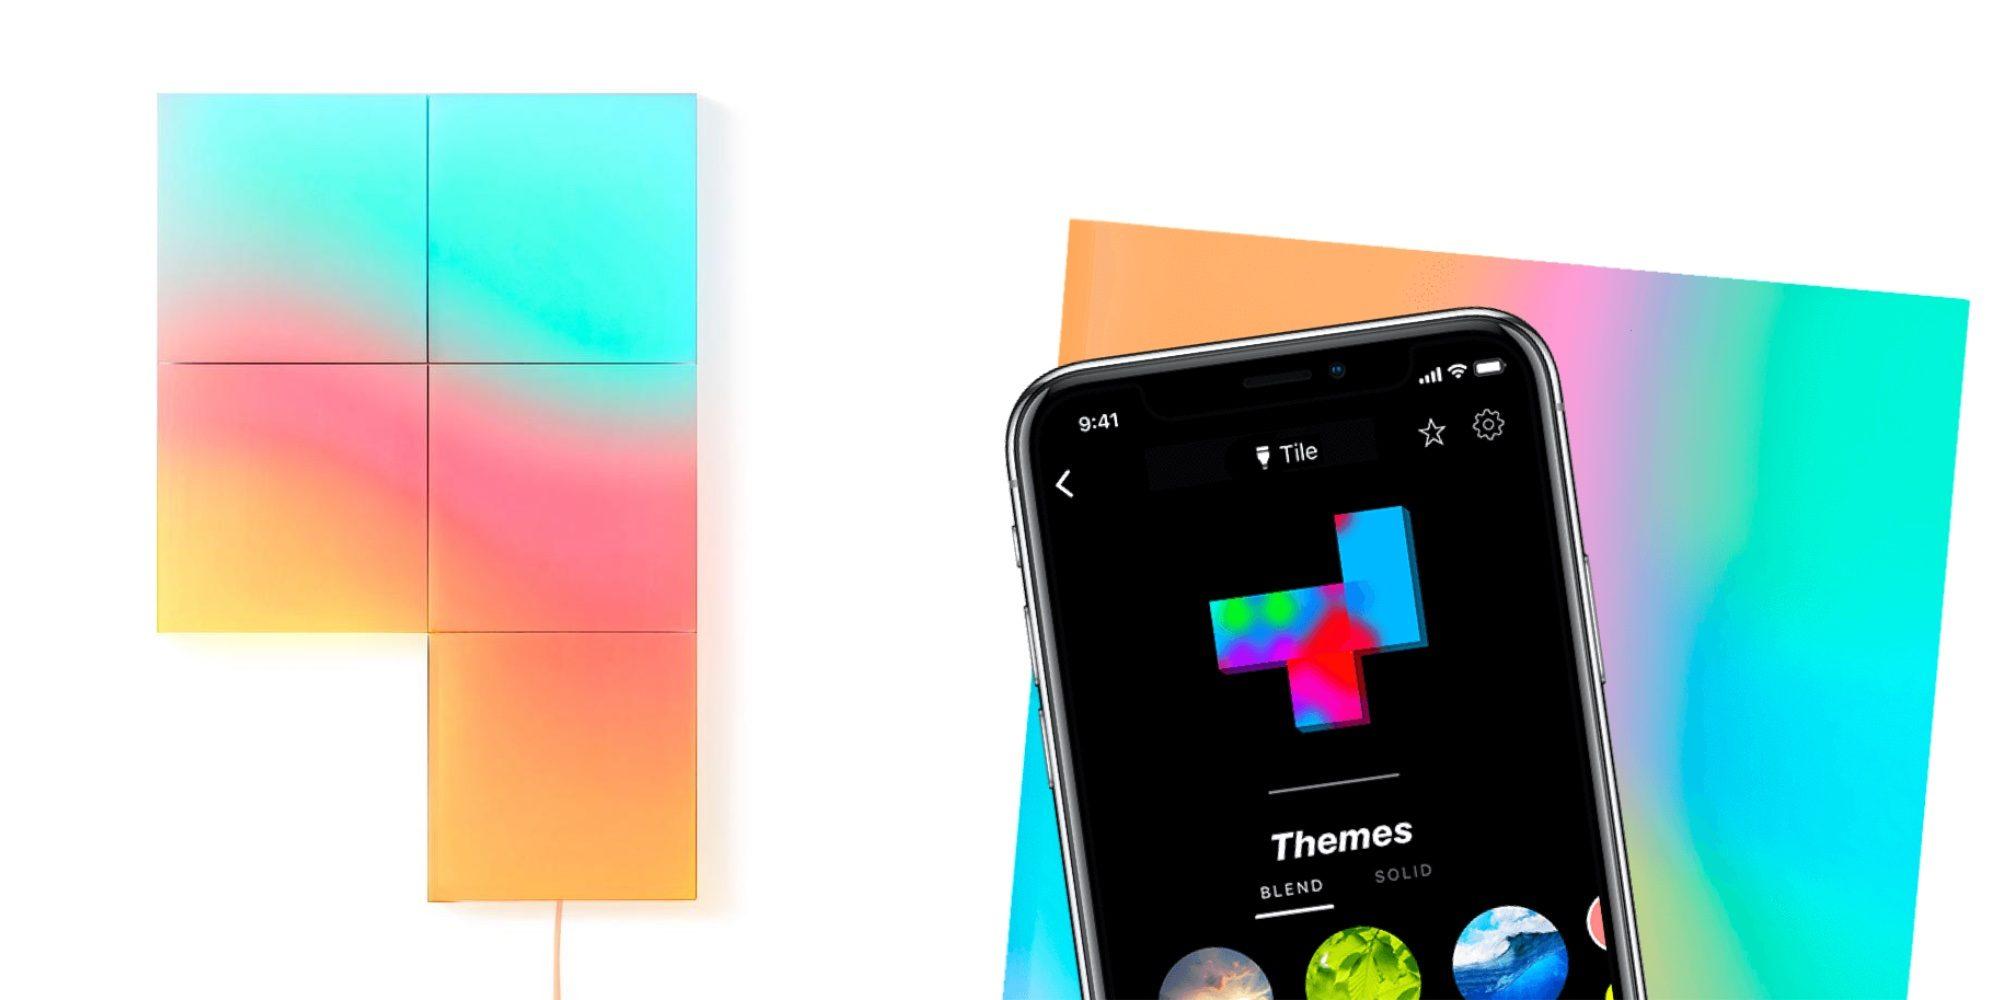 Ambient lighting arrives for $166 with LIFX's Tile HomeKit Starter Kit (36% off)